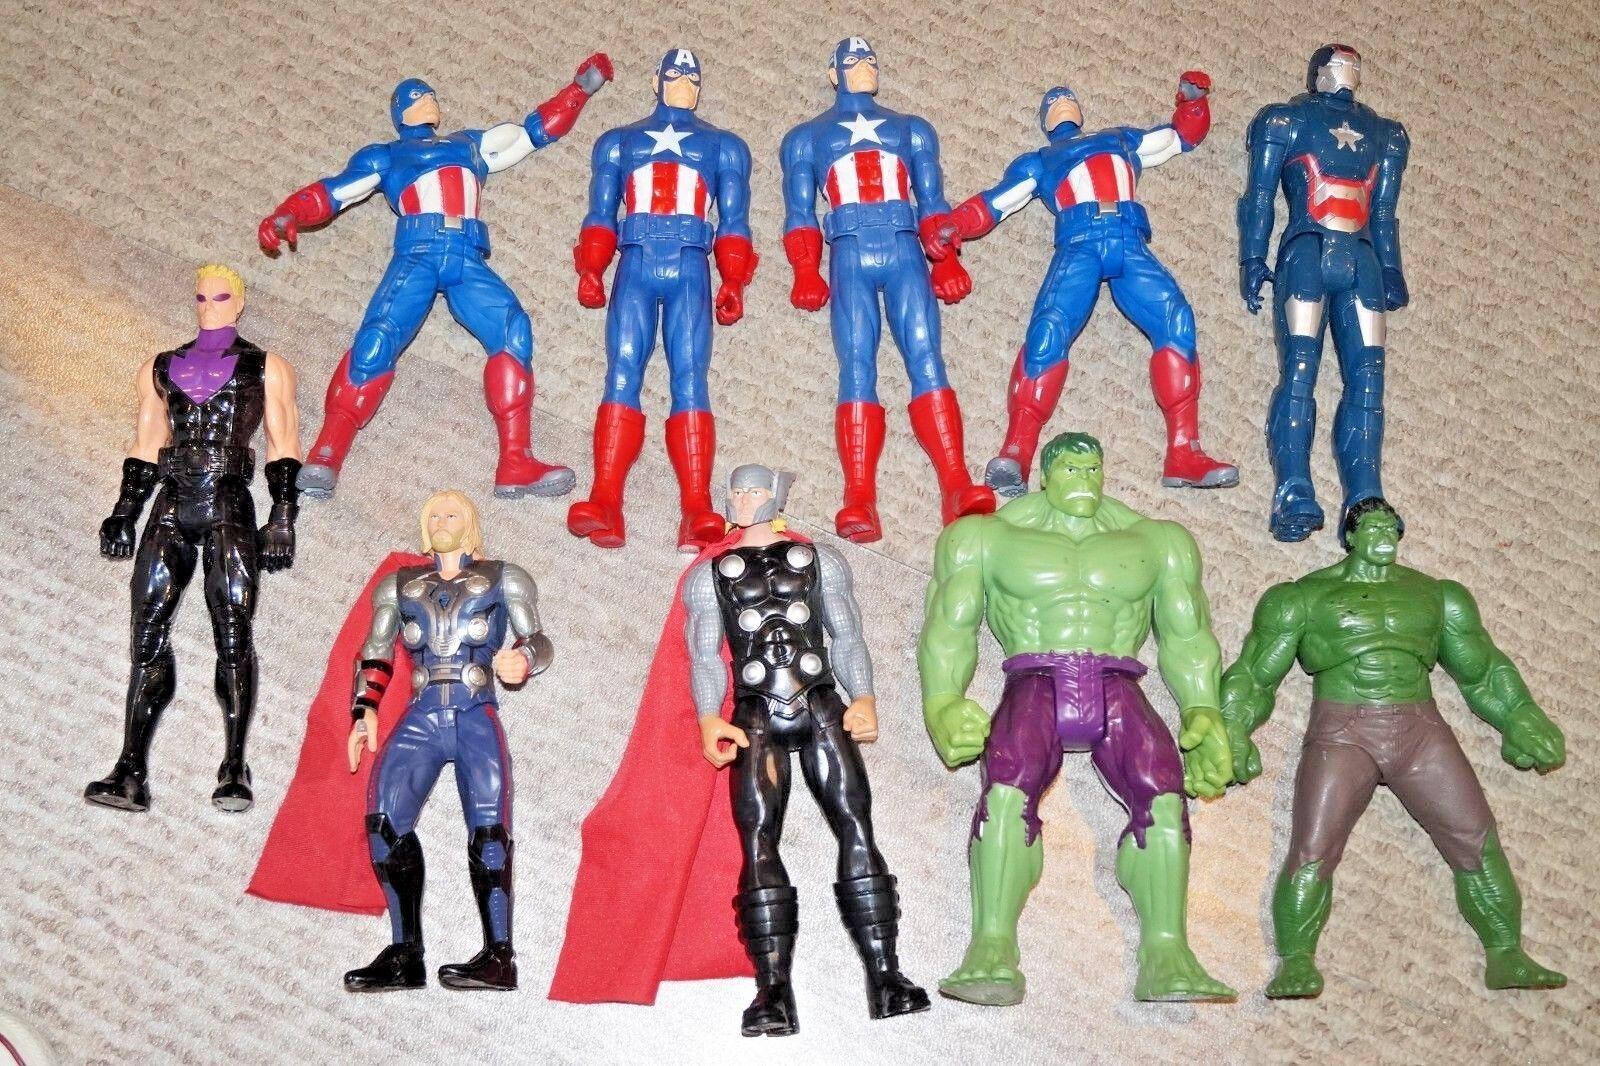 Viele 11 marvel - comics  captain america, hulk, thor haweye action - figuren